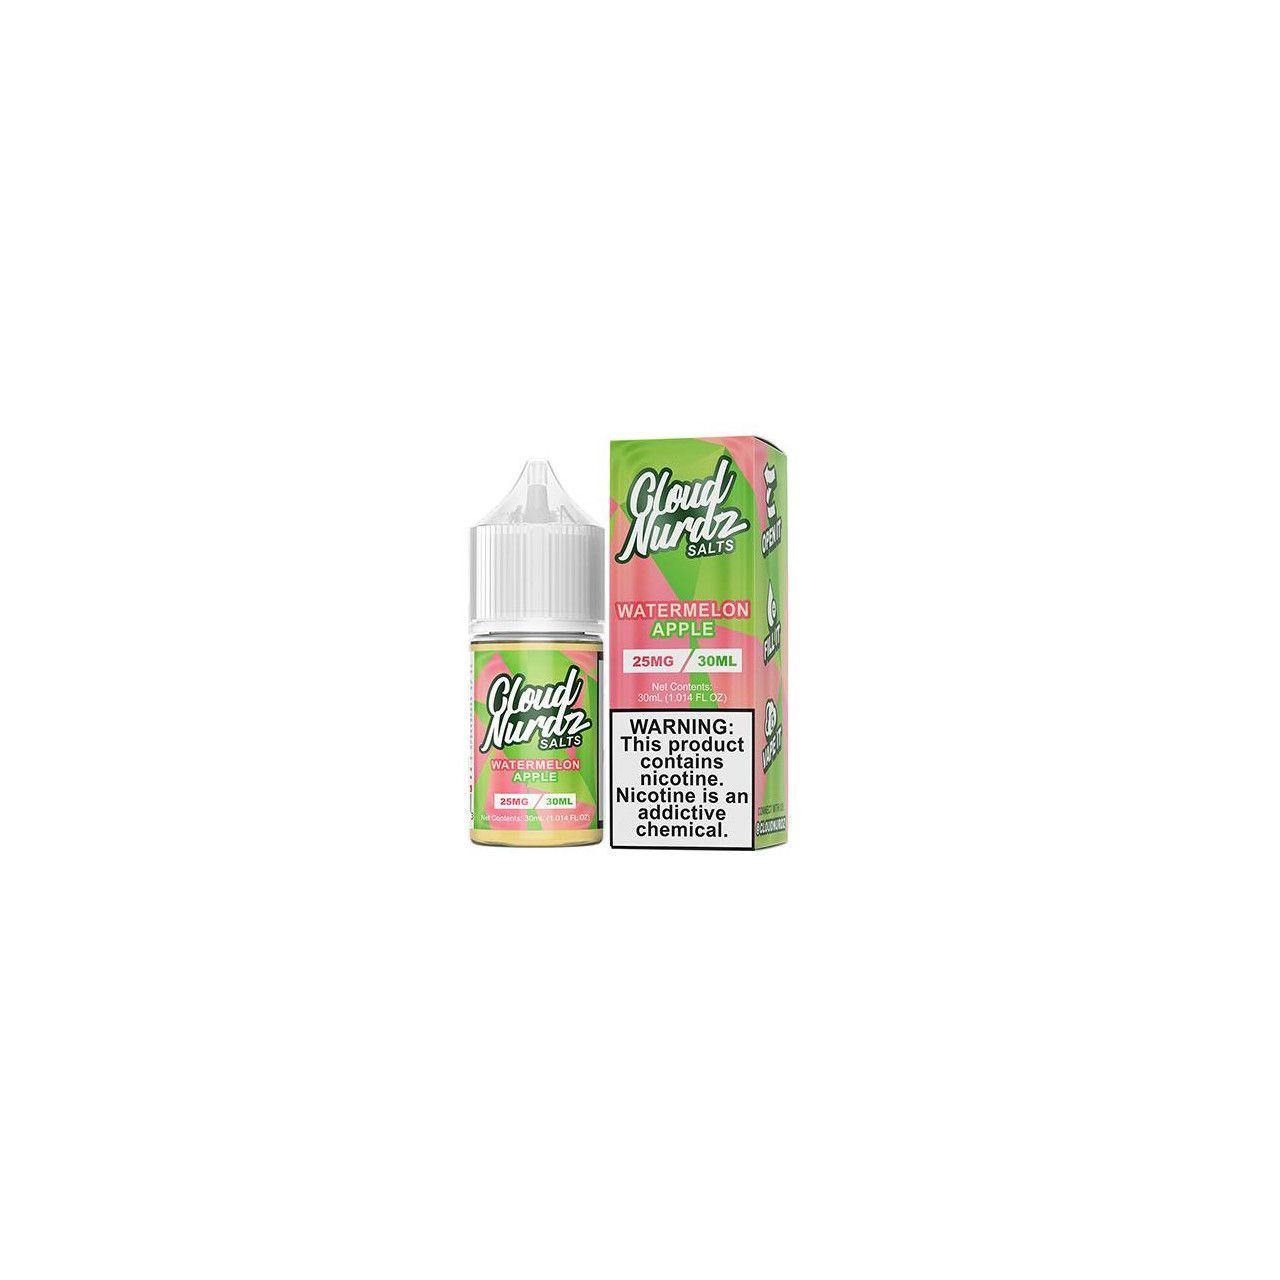 Líquido (Juice) - Nic Salt - Cloud Nurdz - Watermelon Apple